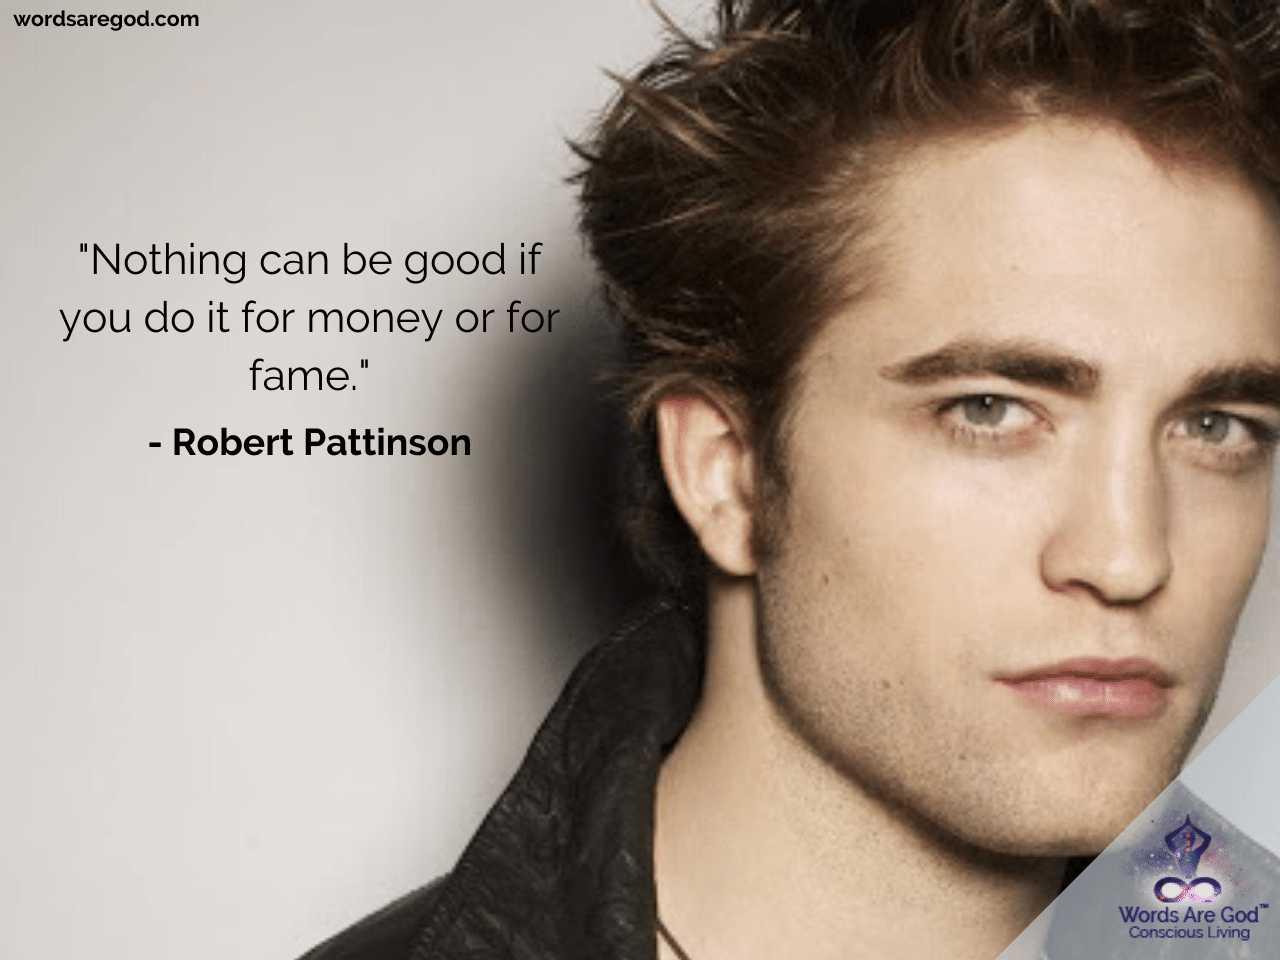 Robert Pattinson Life Quotes by Robert Pattinson